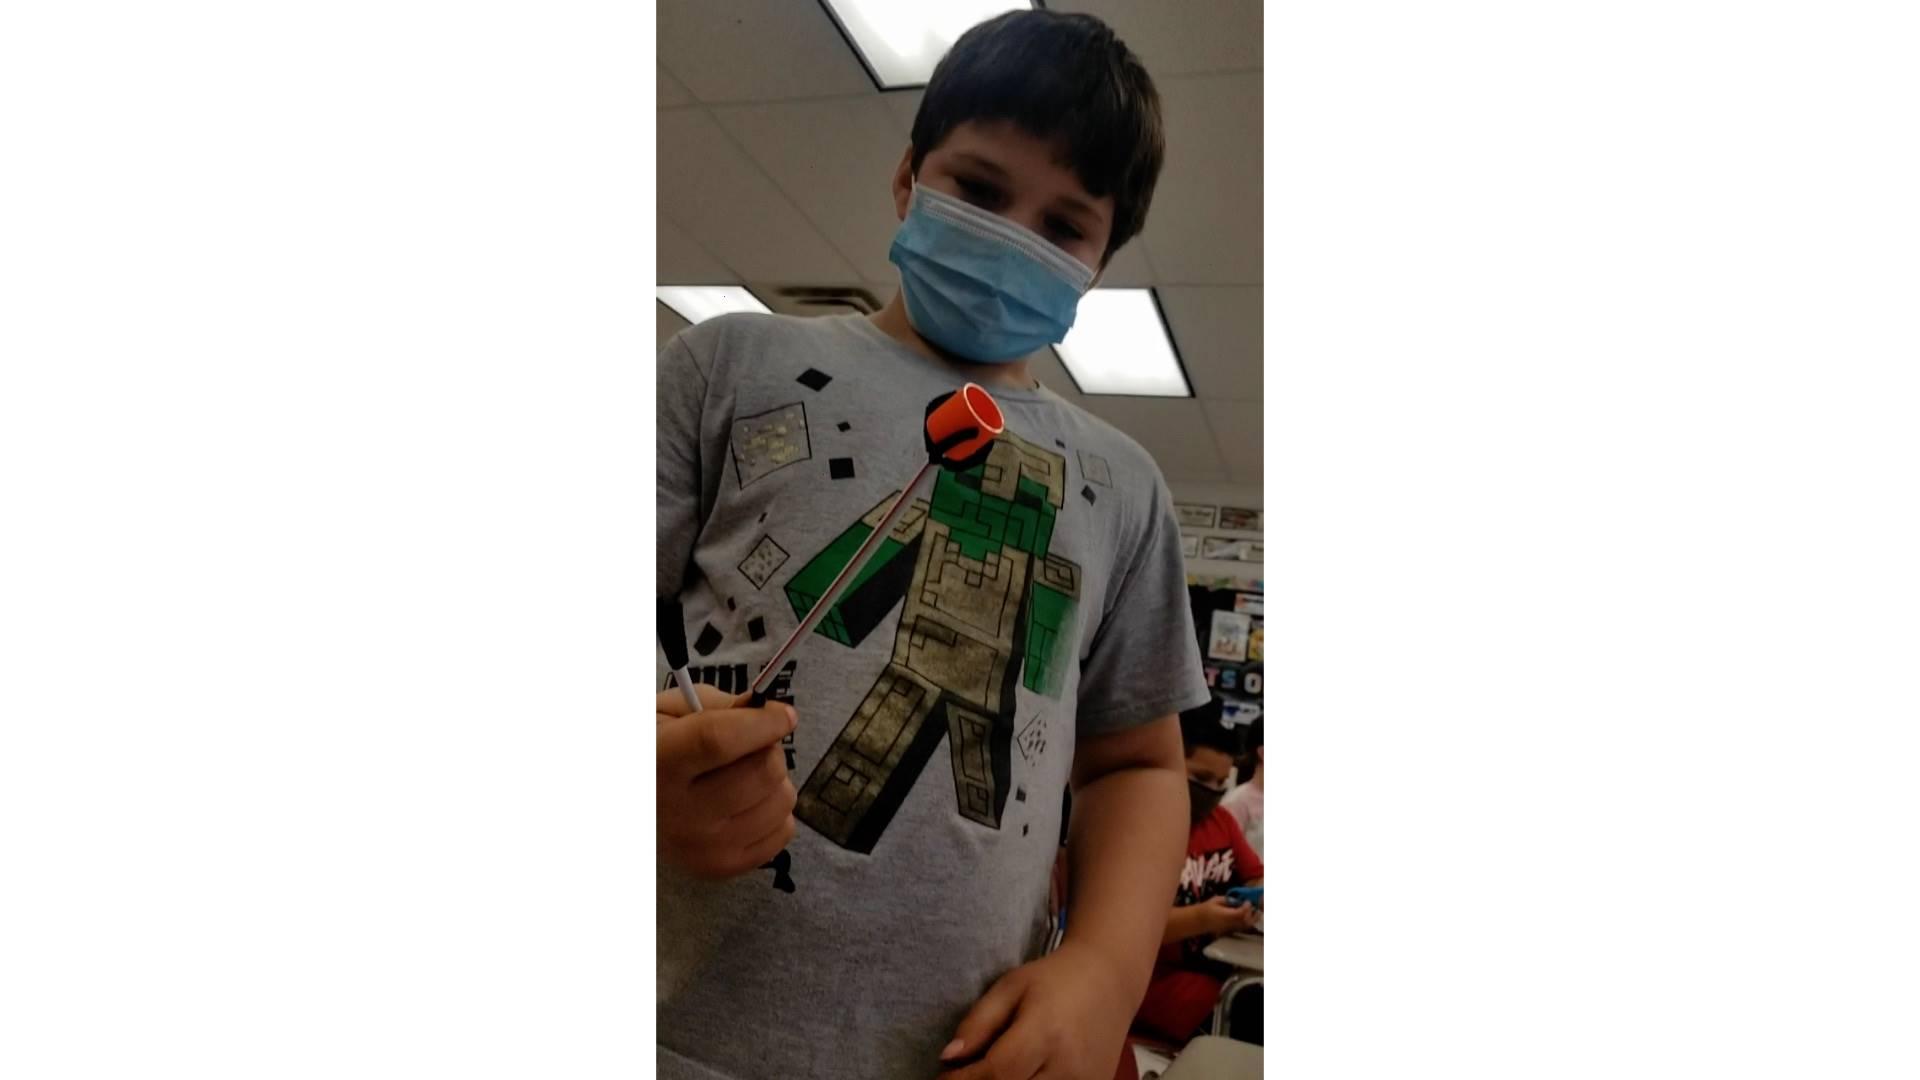 Malik Wills - 4th Grade - Garfield - Doctor Octopus Working Arm - 9/13/21